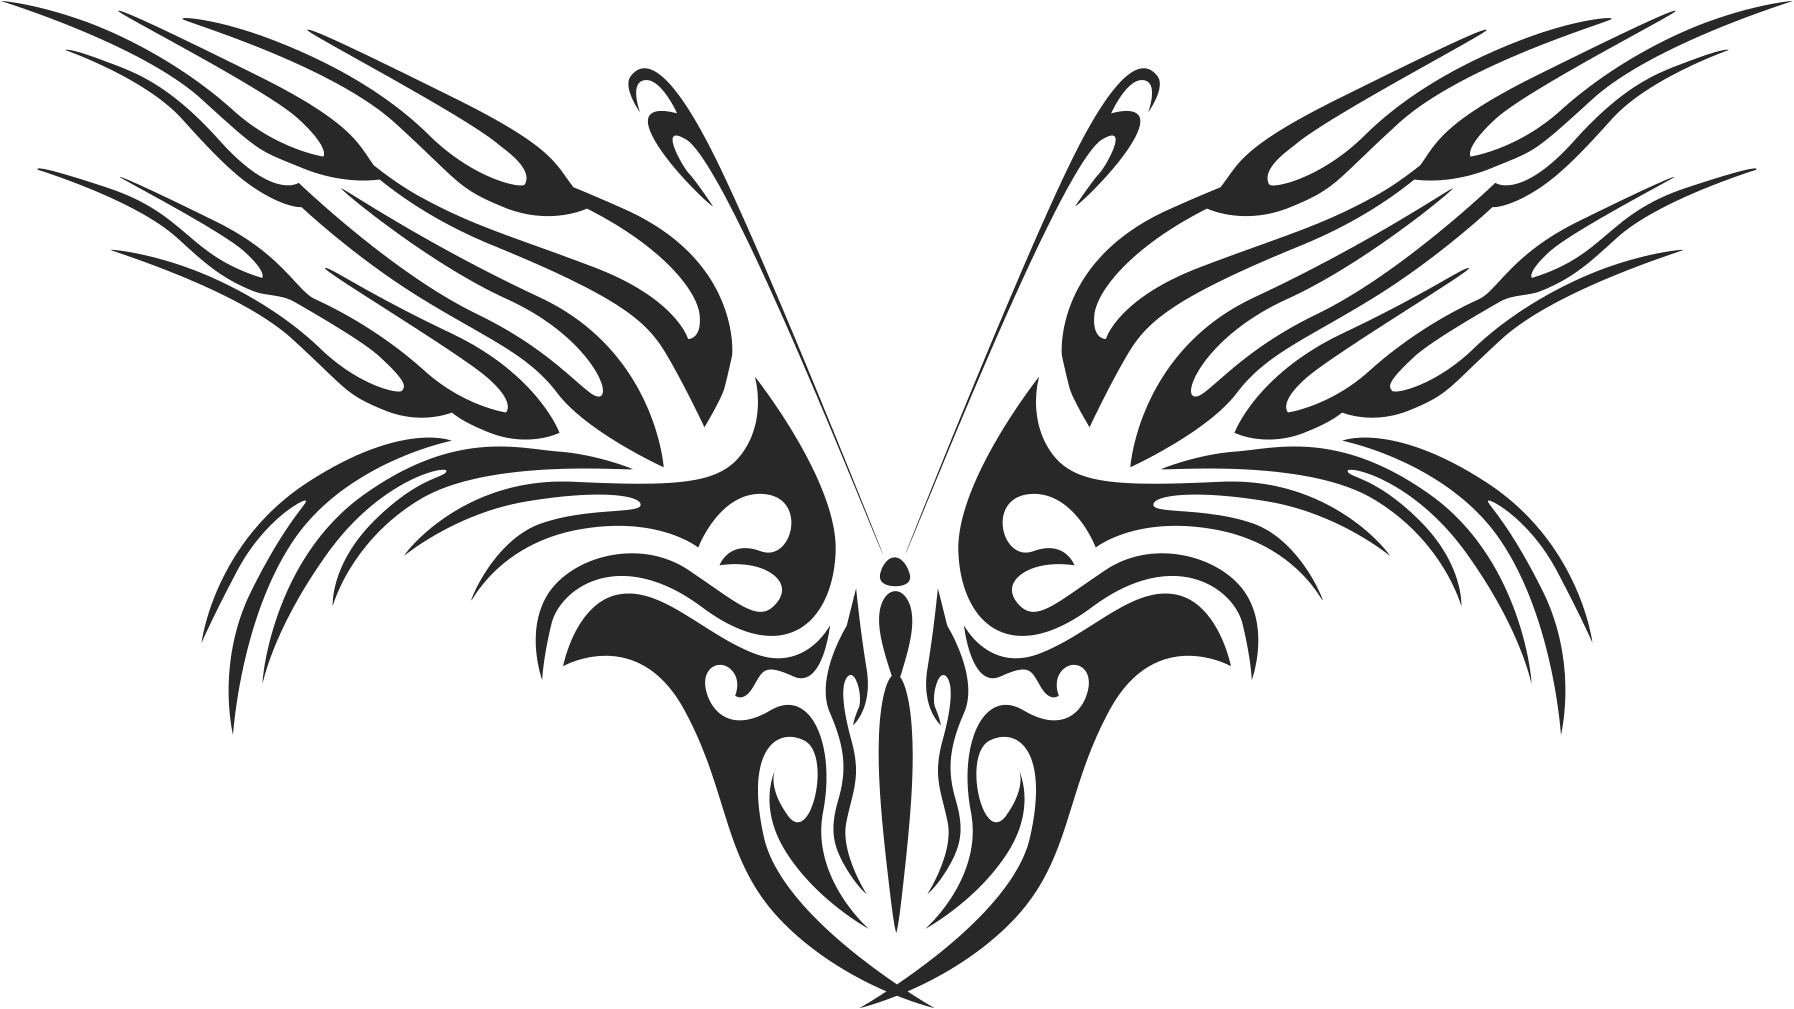 Butterfly Vector Art 046 Free CDR Vectors Art